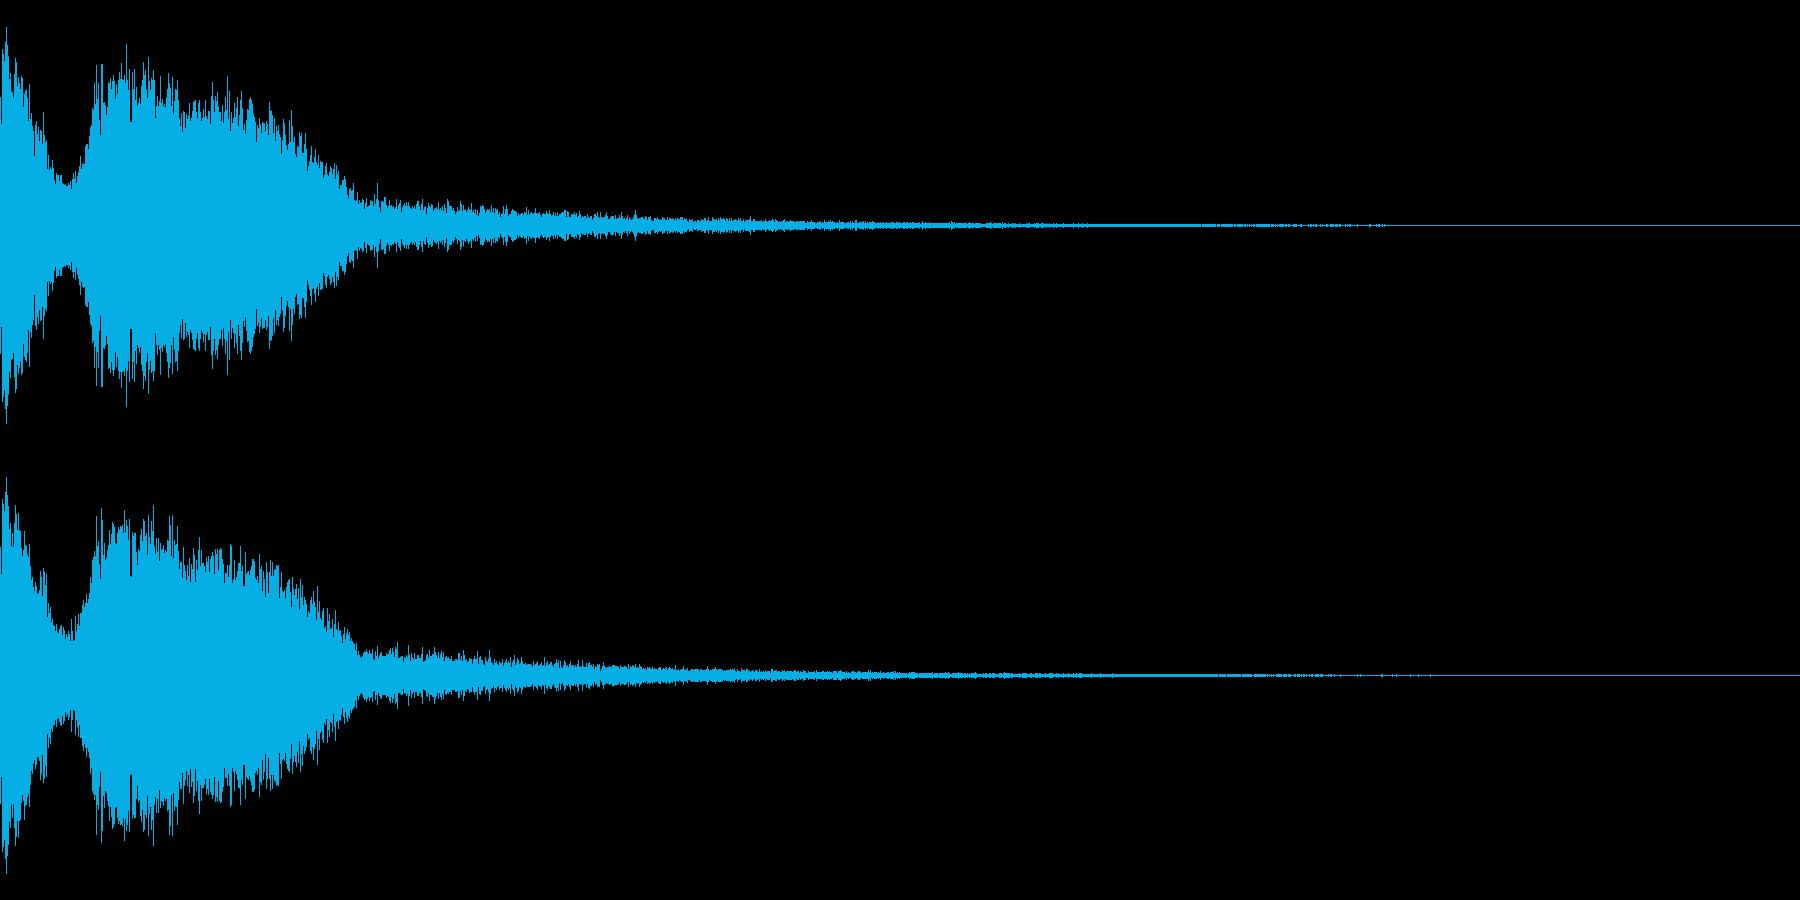 DJFX ヒットチャート発表前SE 1の再生済みの波形